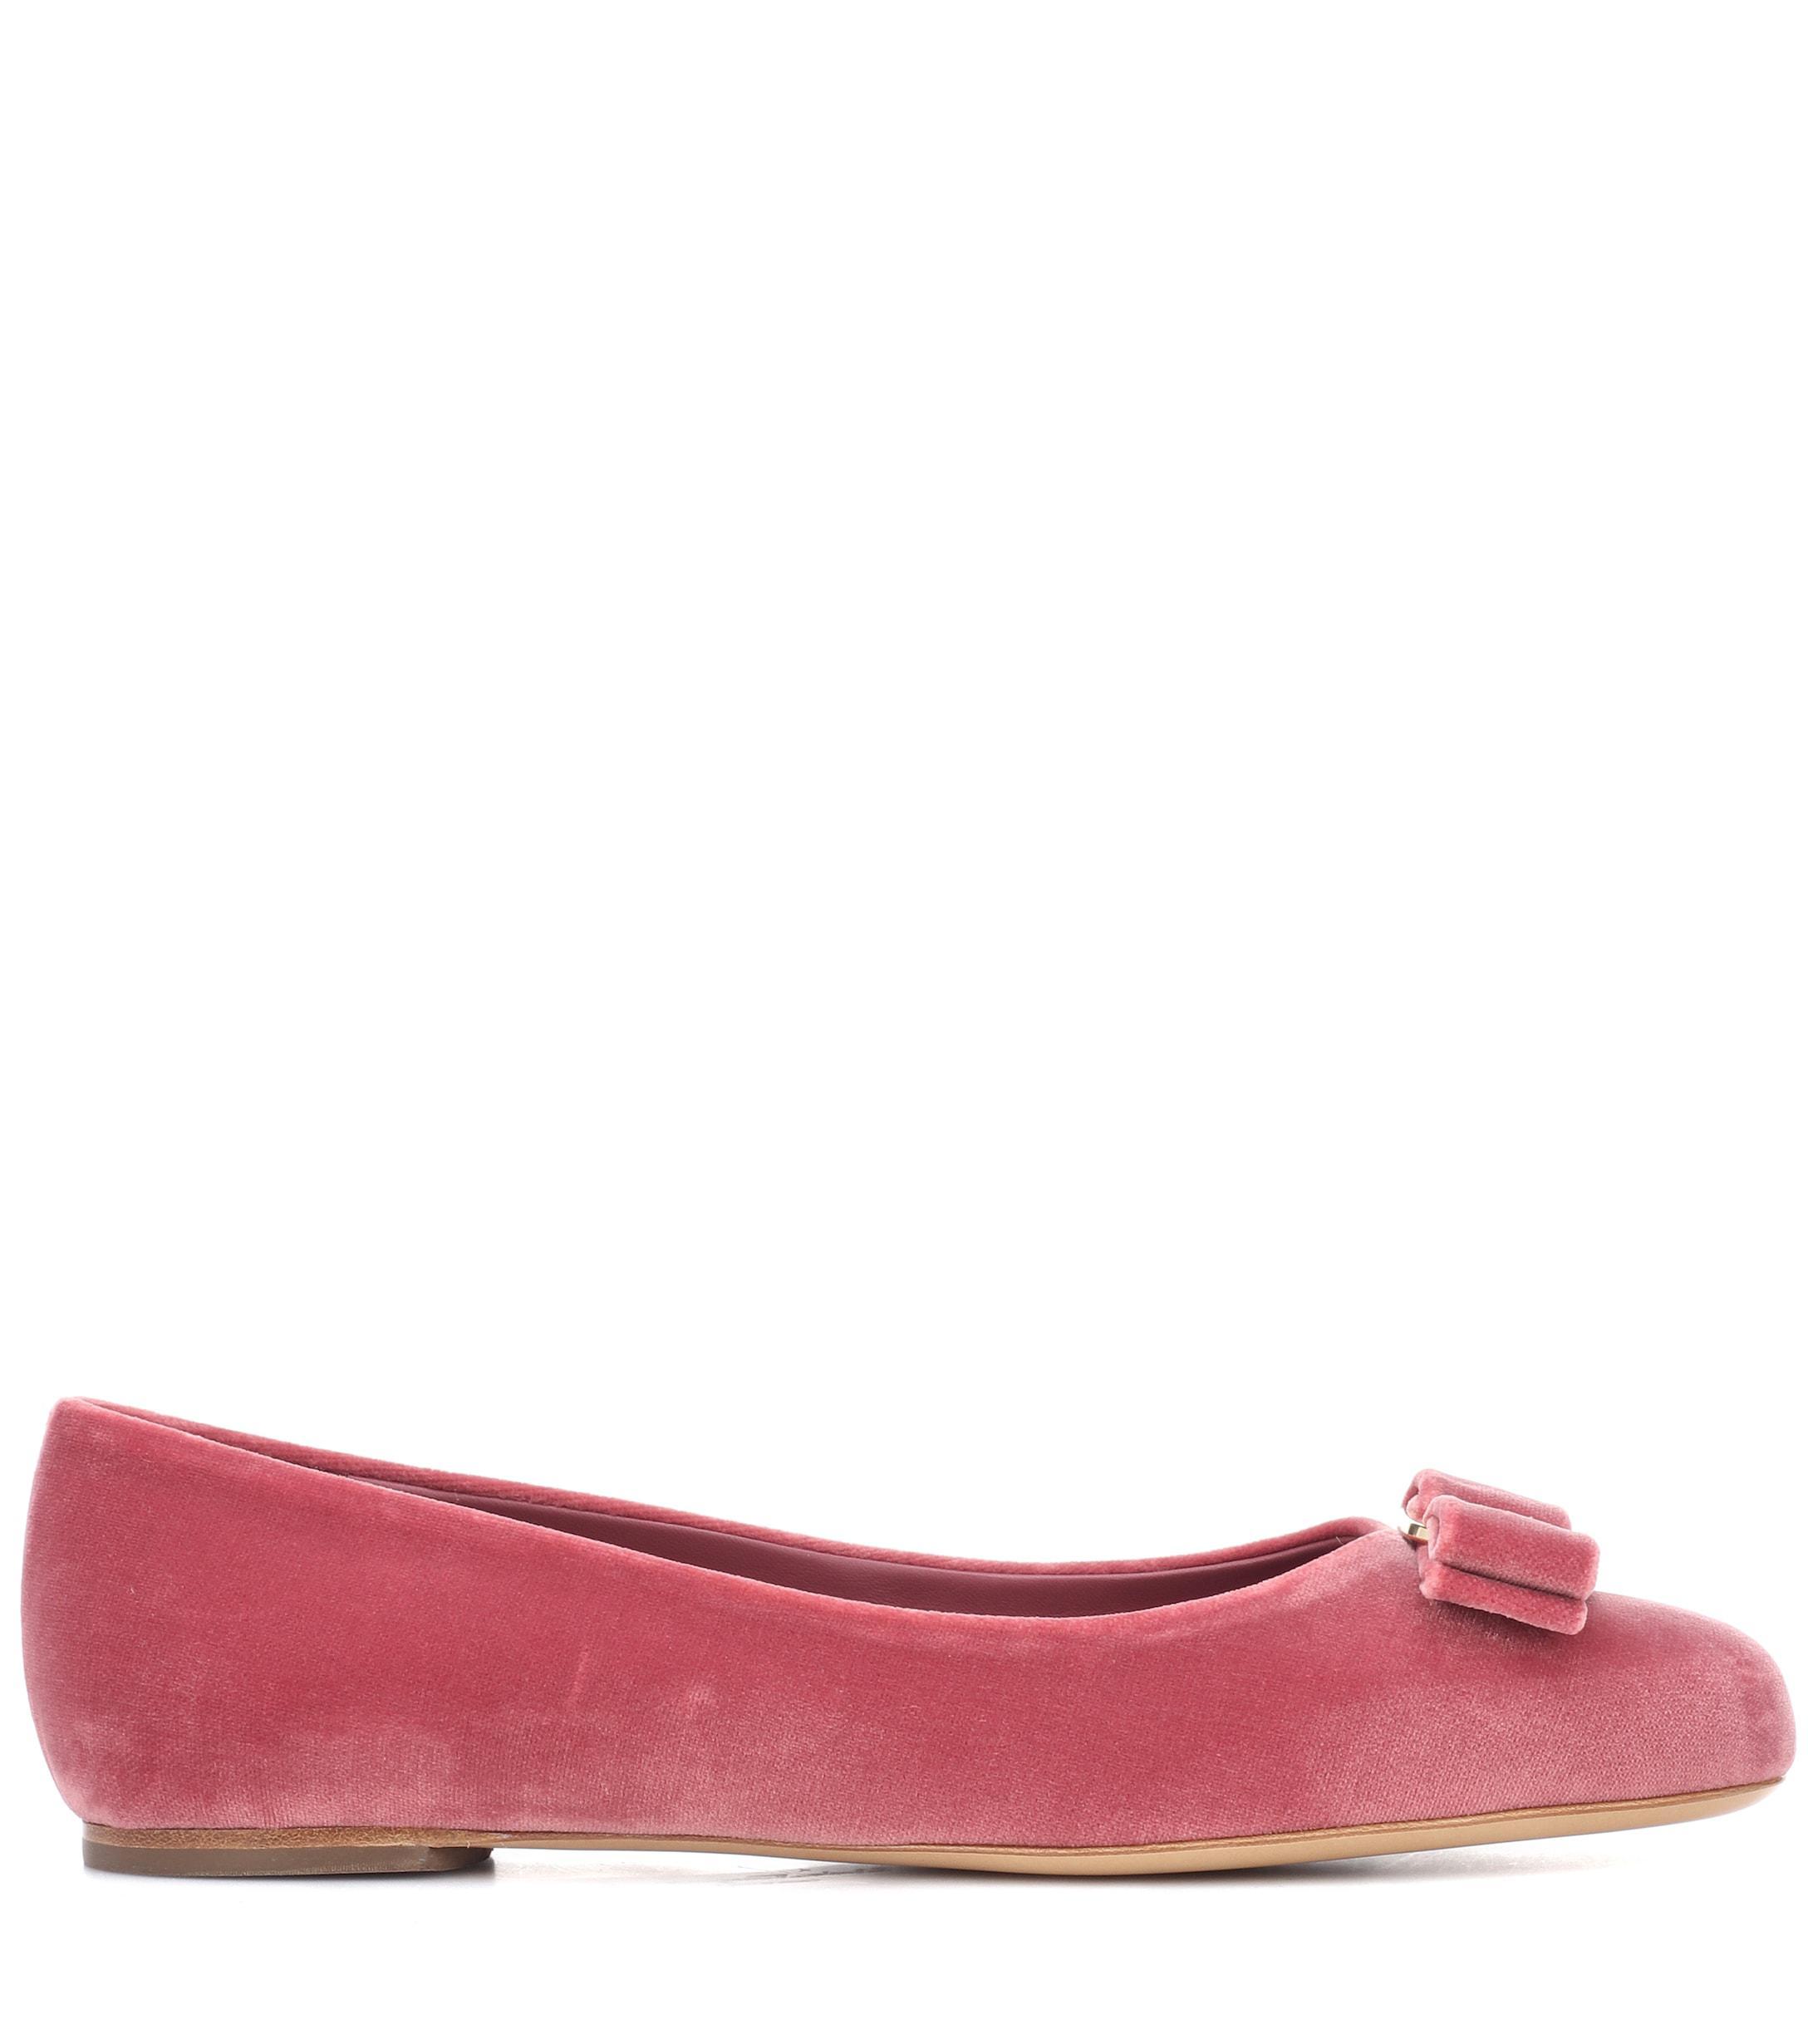 Zapatos planos de terciopelo Varina Ferragamo de Terciopelo de color Rosa